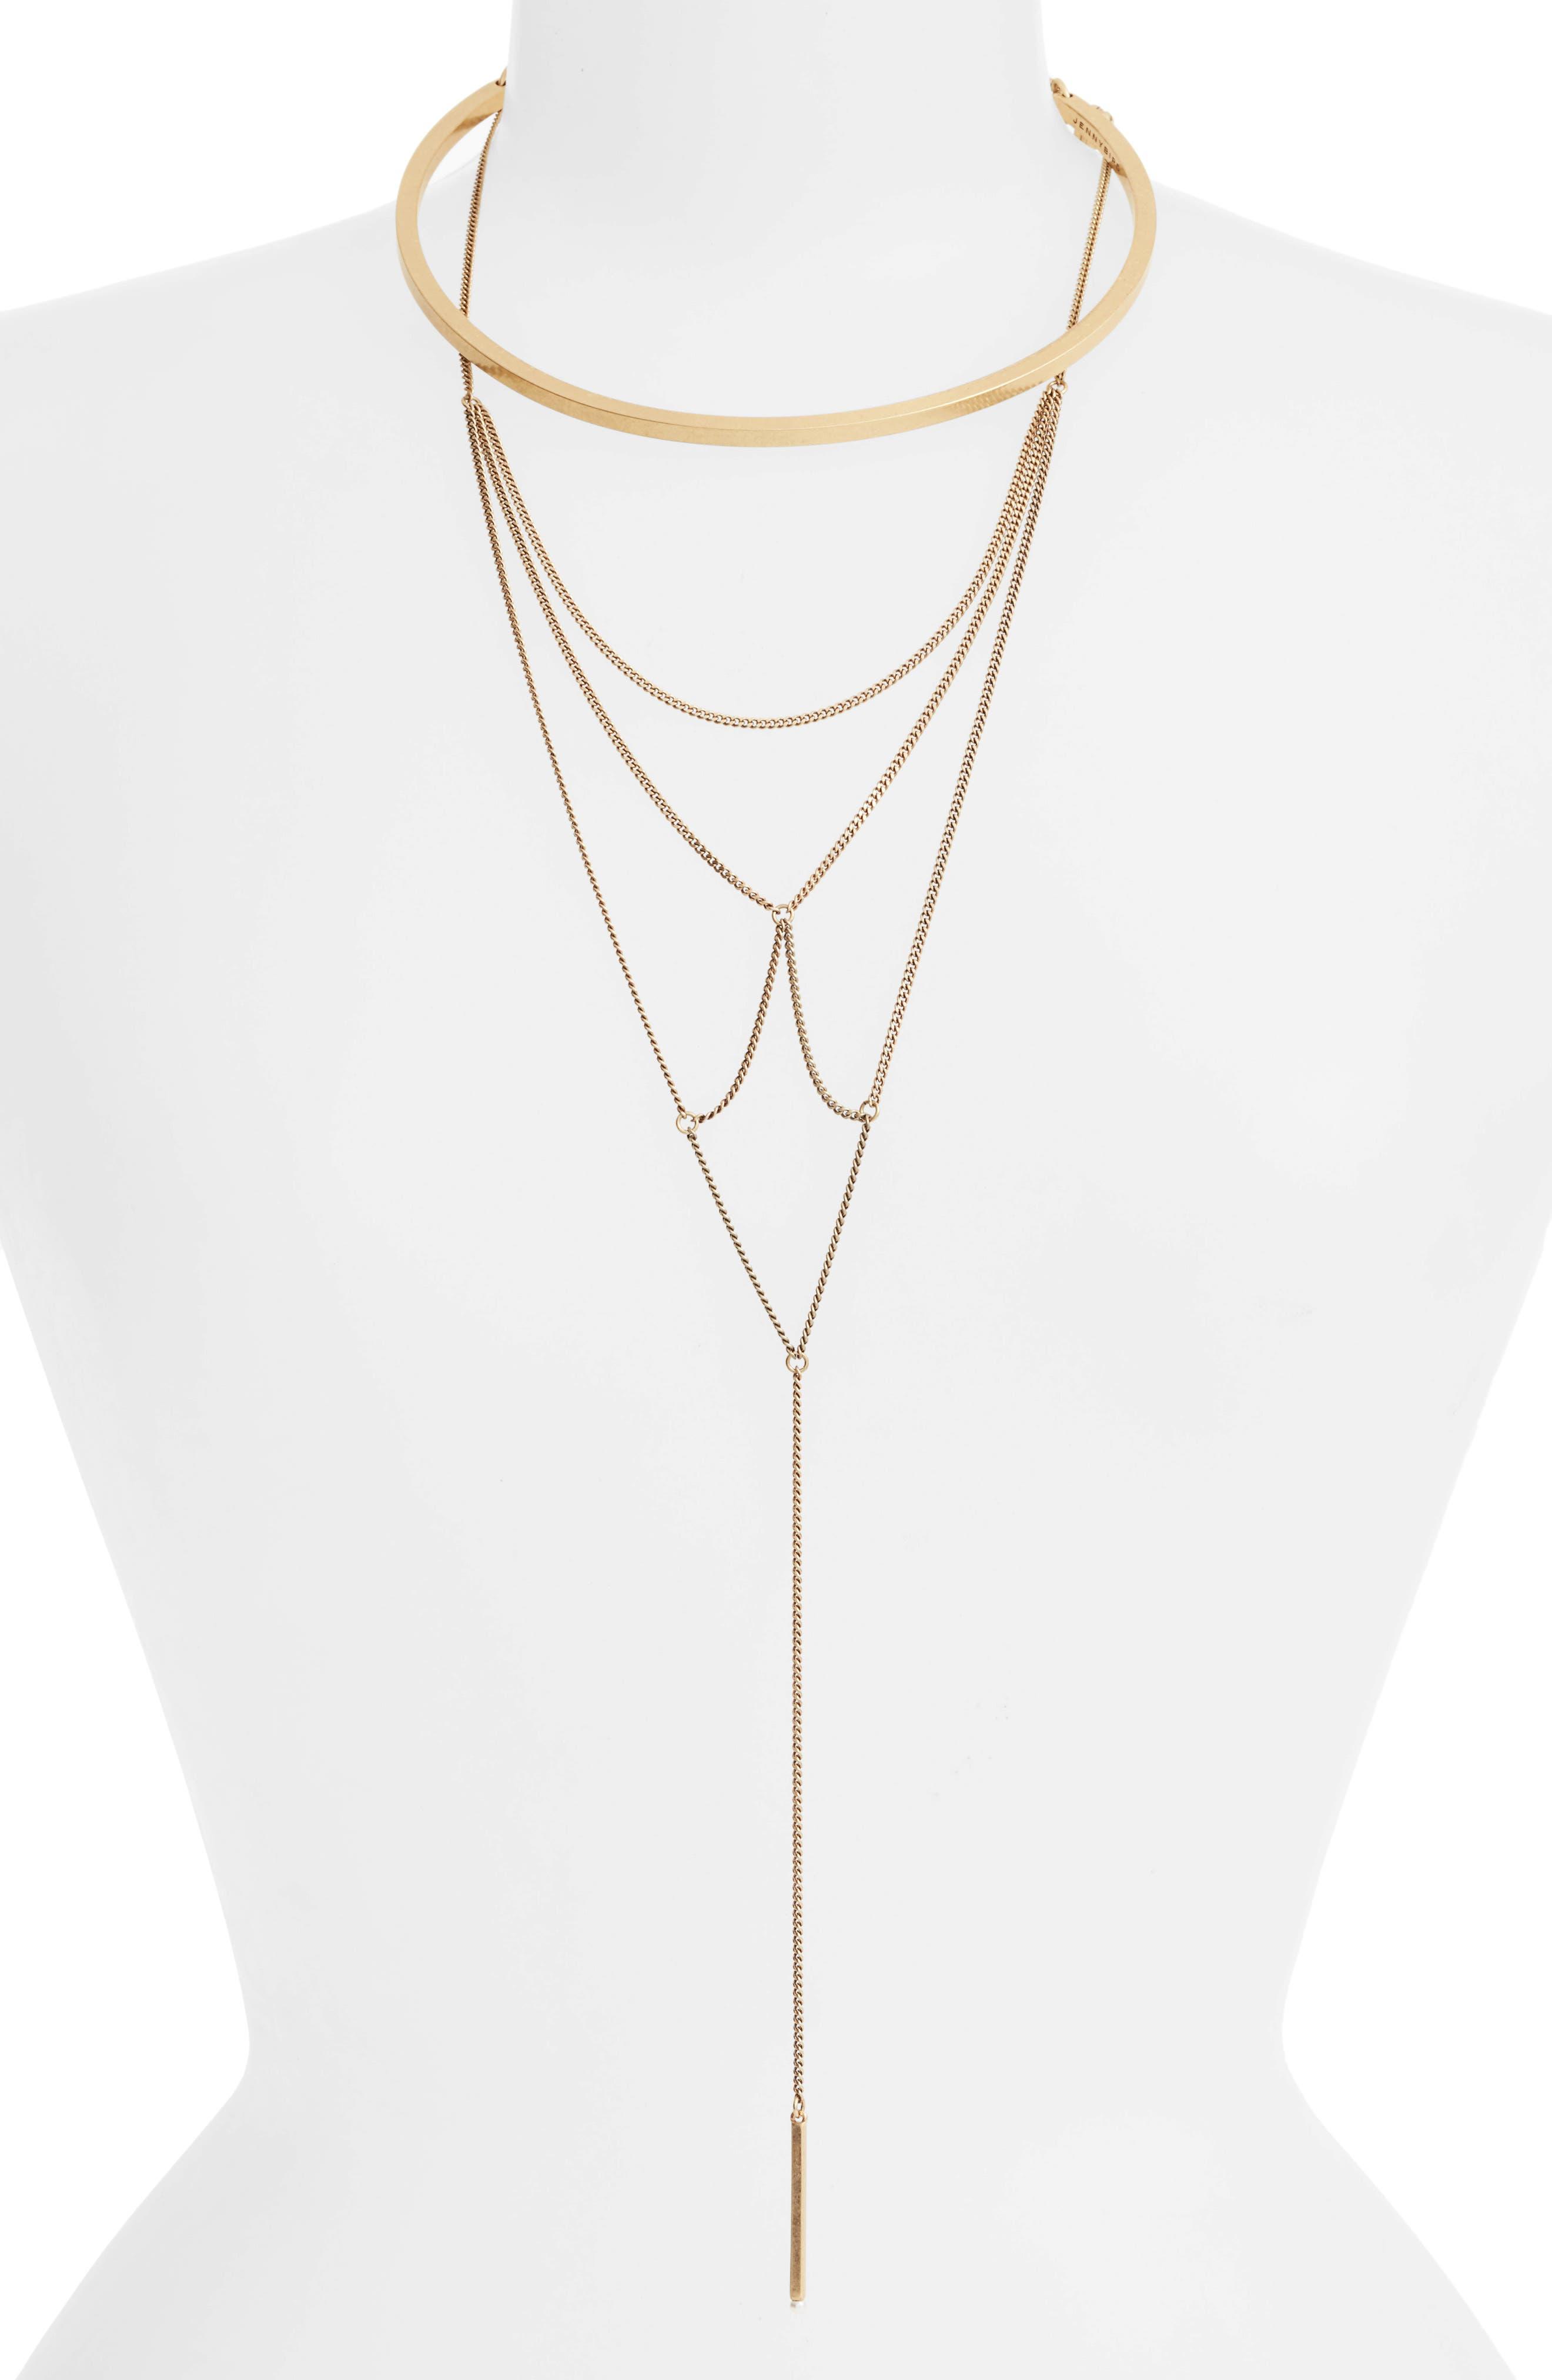 Main Image - Jenny Bird Neith Convertible Necklace